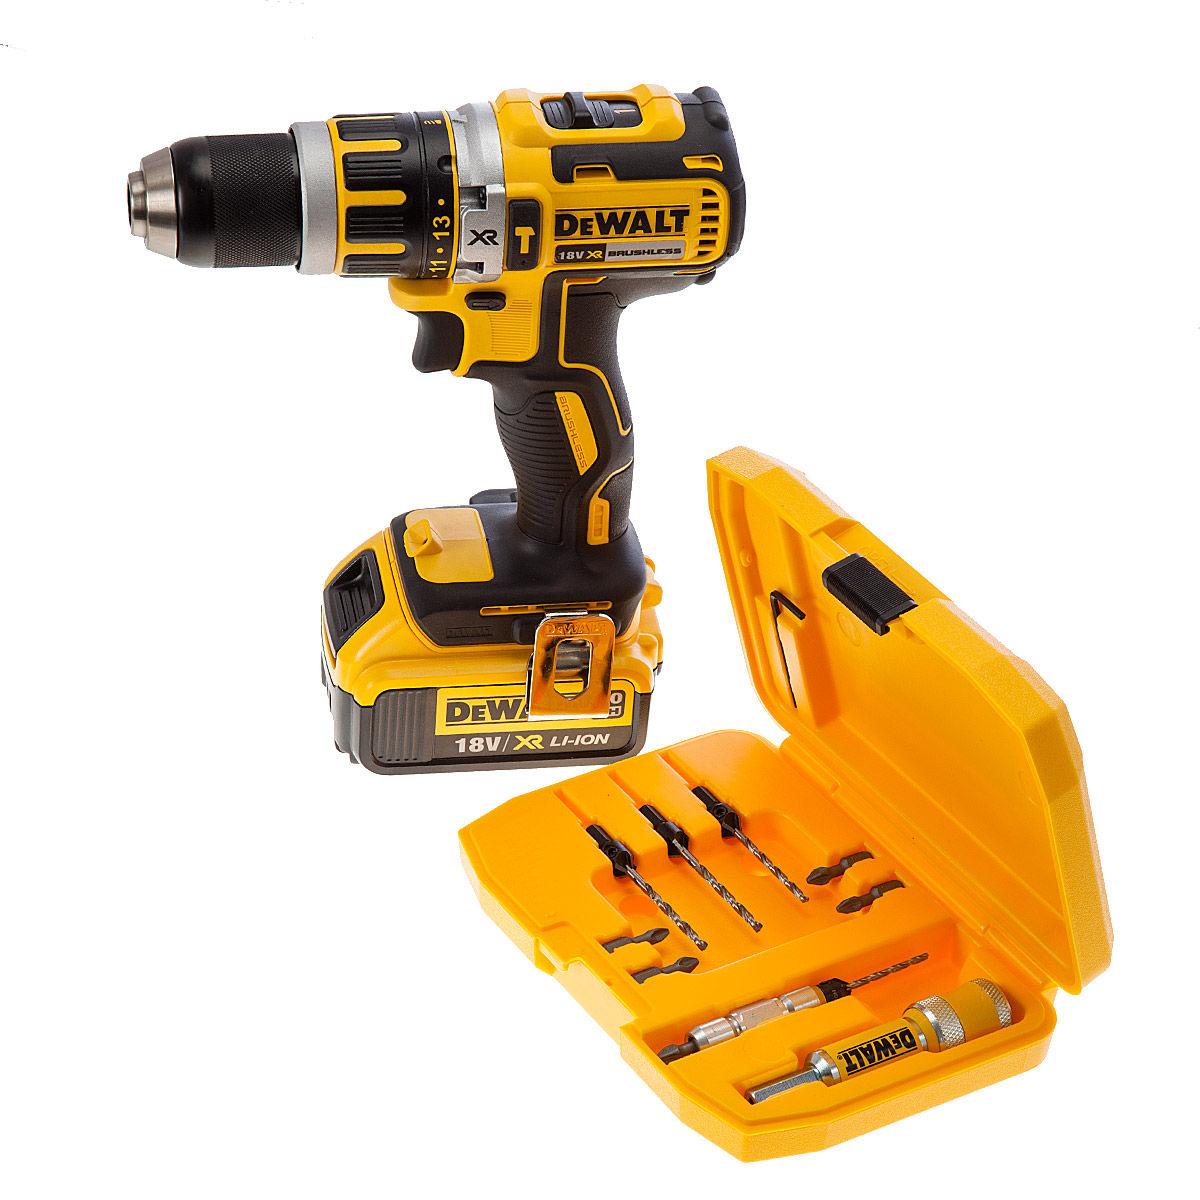 toolstop dewalt dcd795m1 combi drill 18v 1 x 4ah battery dt7612 quick change drill drive. Black Bedroom Furniture Sets. Home Design Ideas